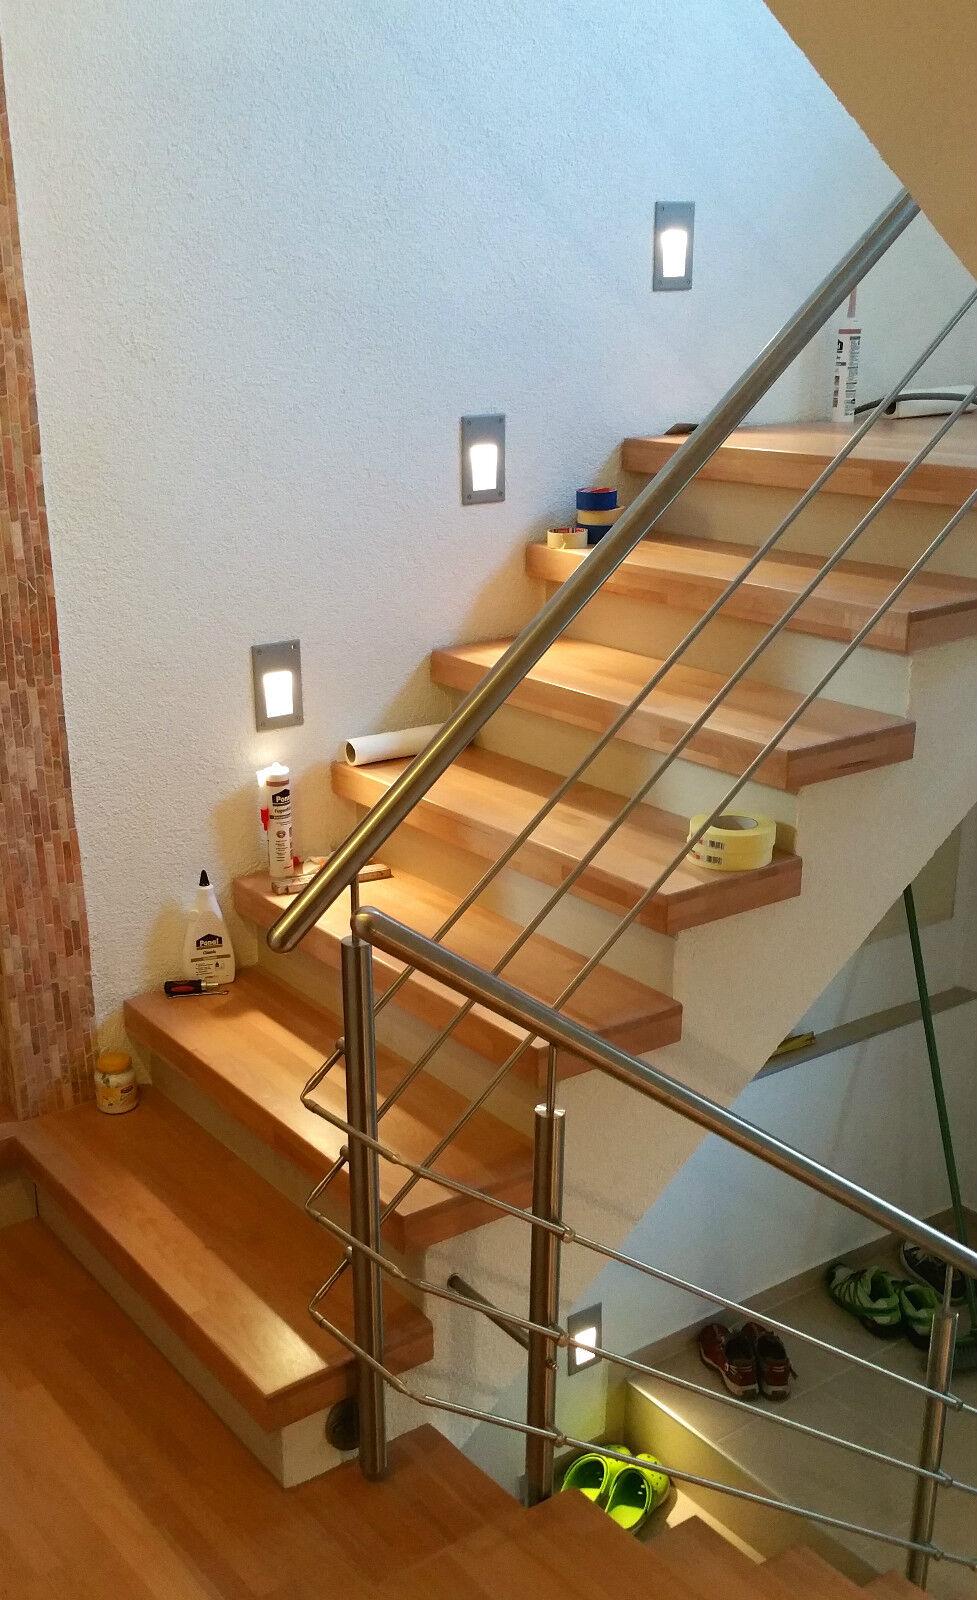 treppenrenovierung f r heimwerker stufen aus echtem holz kompletter bausatz eur 35 95. Black Bedroom Furniture Sets. Home Design Ideas